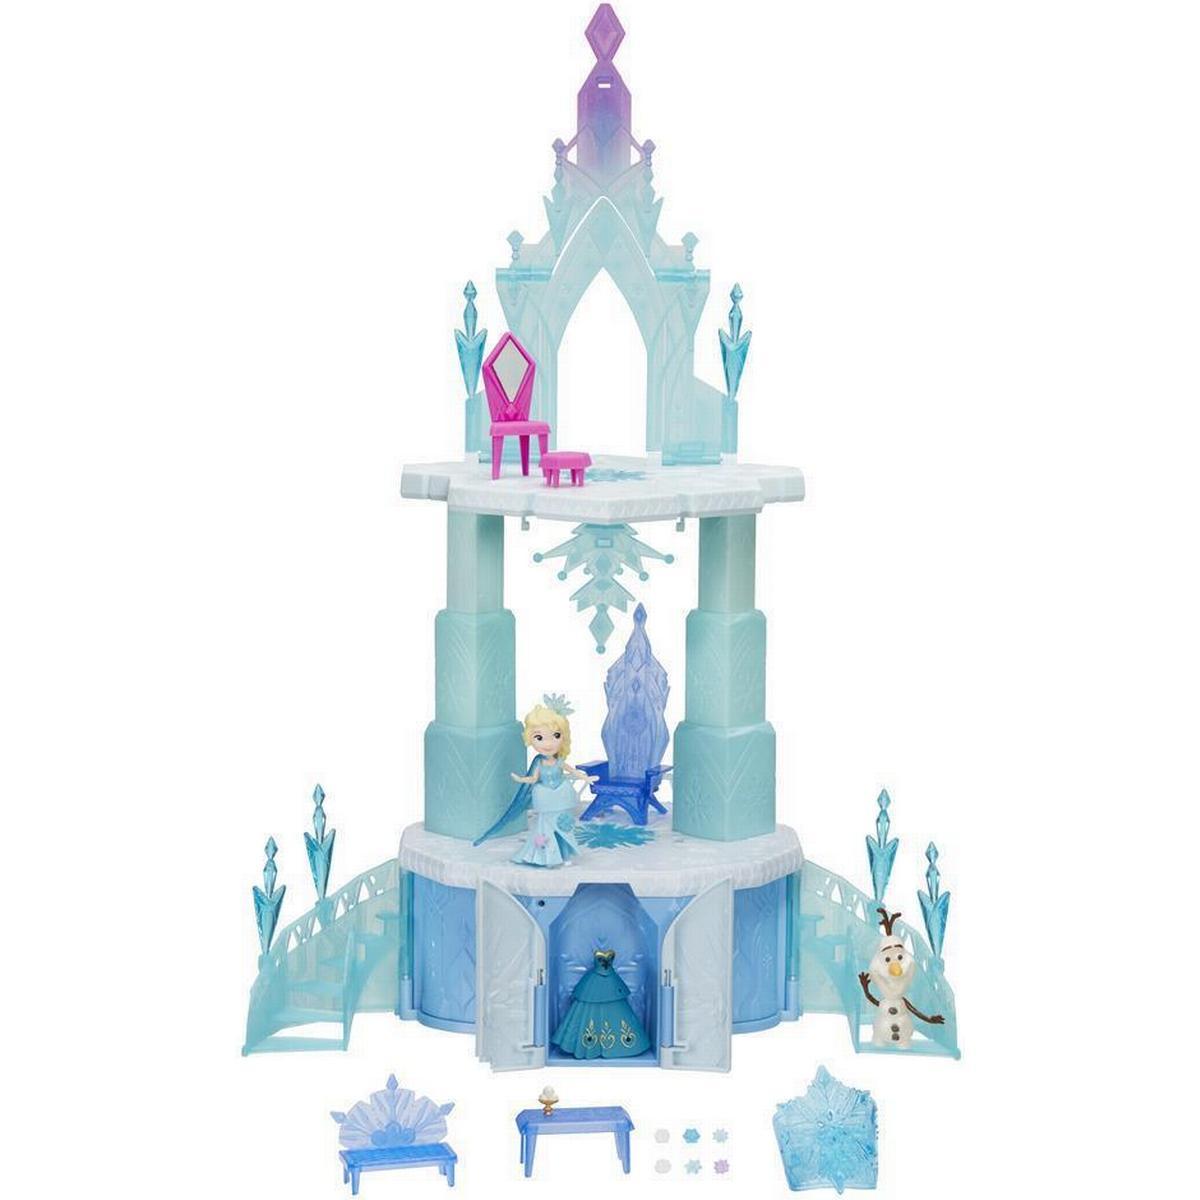 eff163df3755 Frost - Lekset - Jämför priser på Frozen PriceRunner